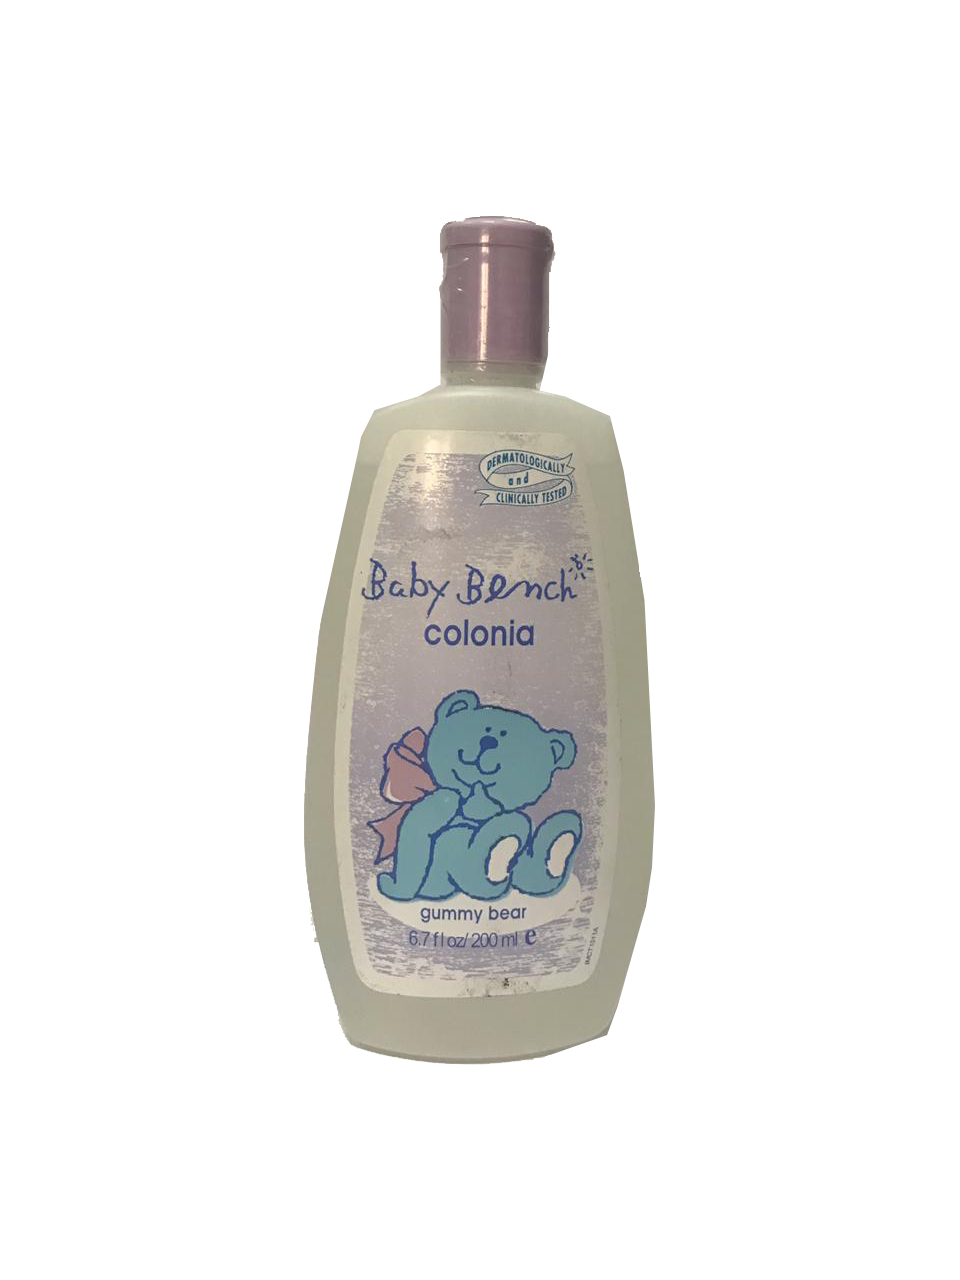 Bench Baby Colonia Gummy Bear 200ml